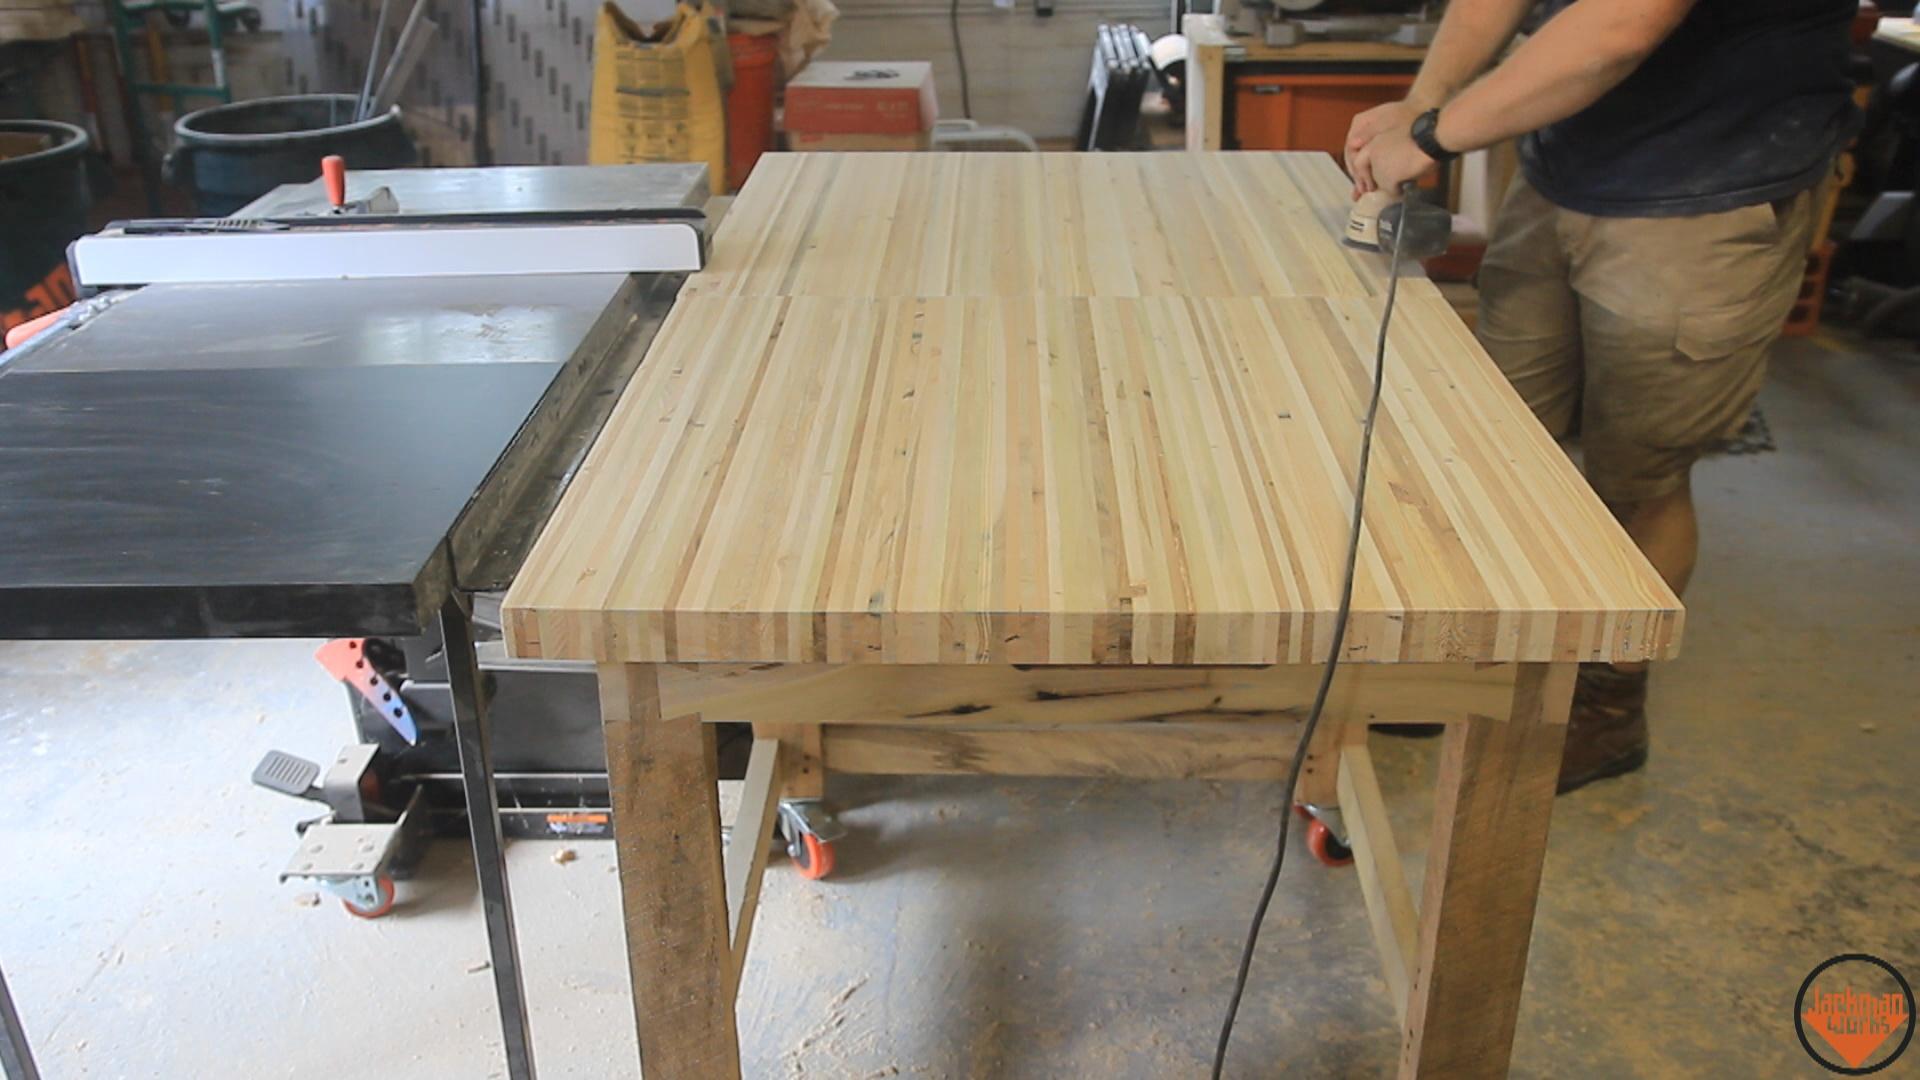 Countertopopallet Tabletoppallet Countertopcastershow Topallet Wood Projectspallet Diypallet Tablepallet Ideaswood Pallet